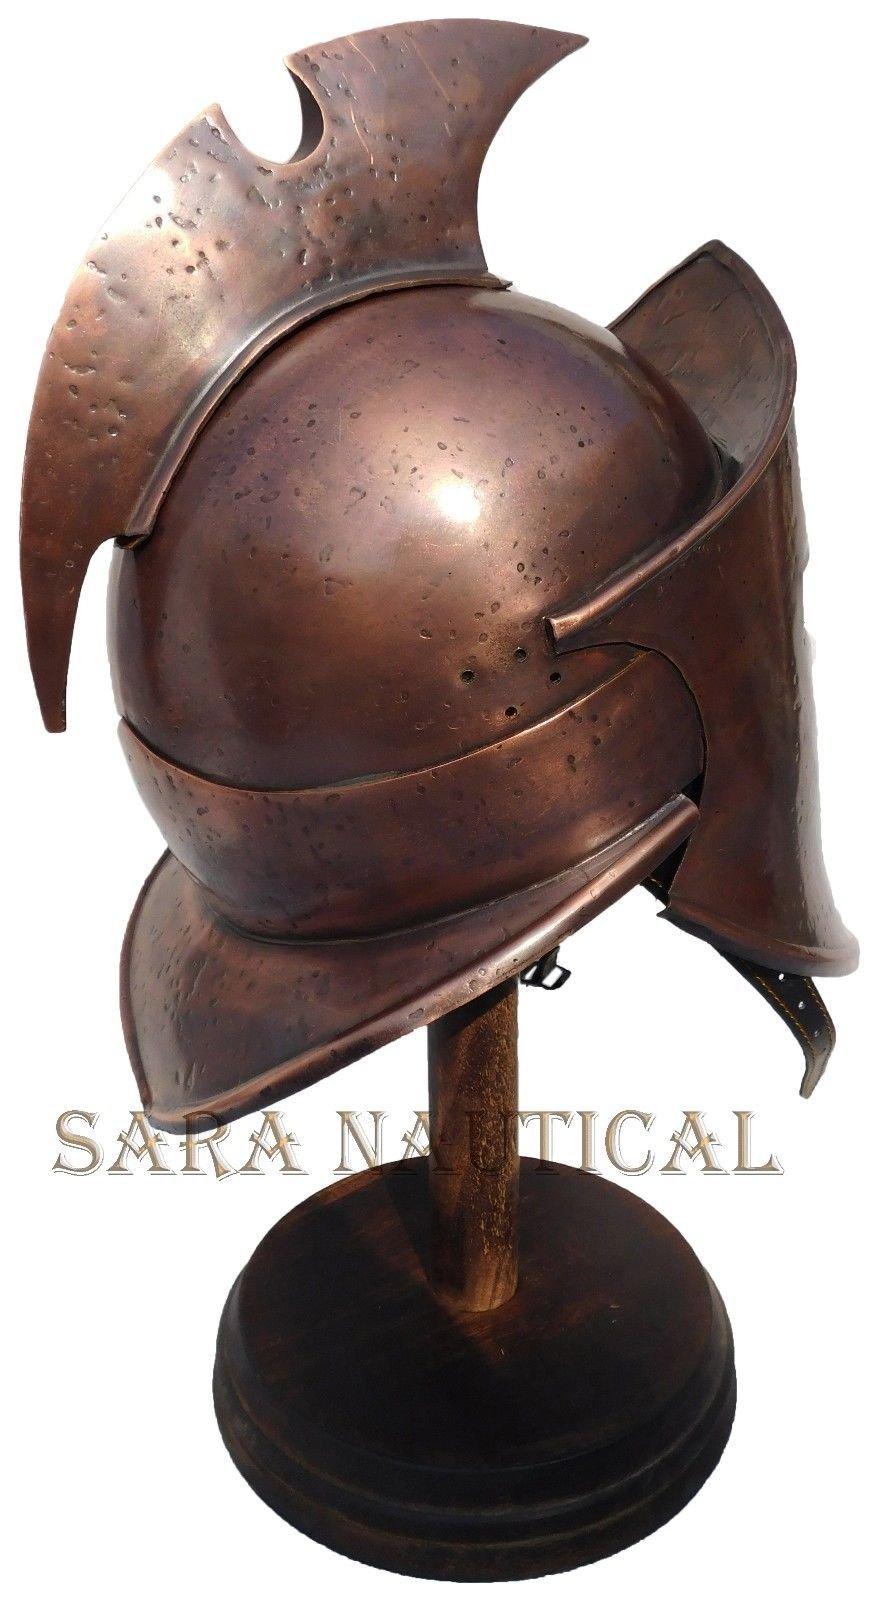 All Metal 300 Spartan Helmet Metal Collectible Decorative Antique Item Halloween Helmet by Expressions Enterprises (Image #3)